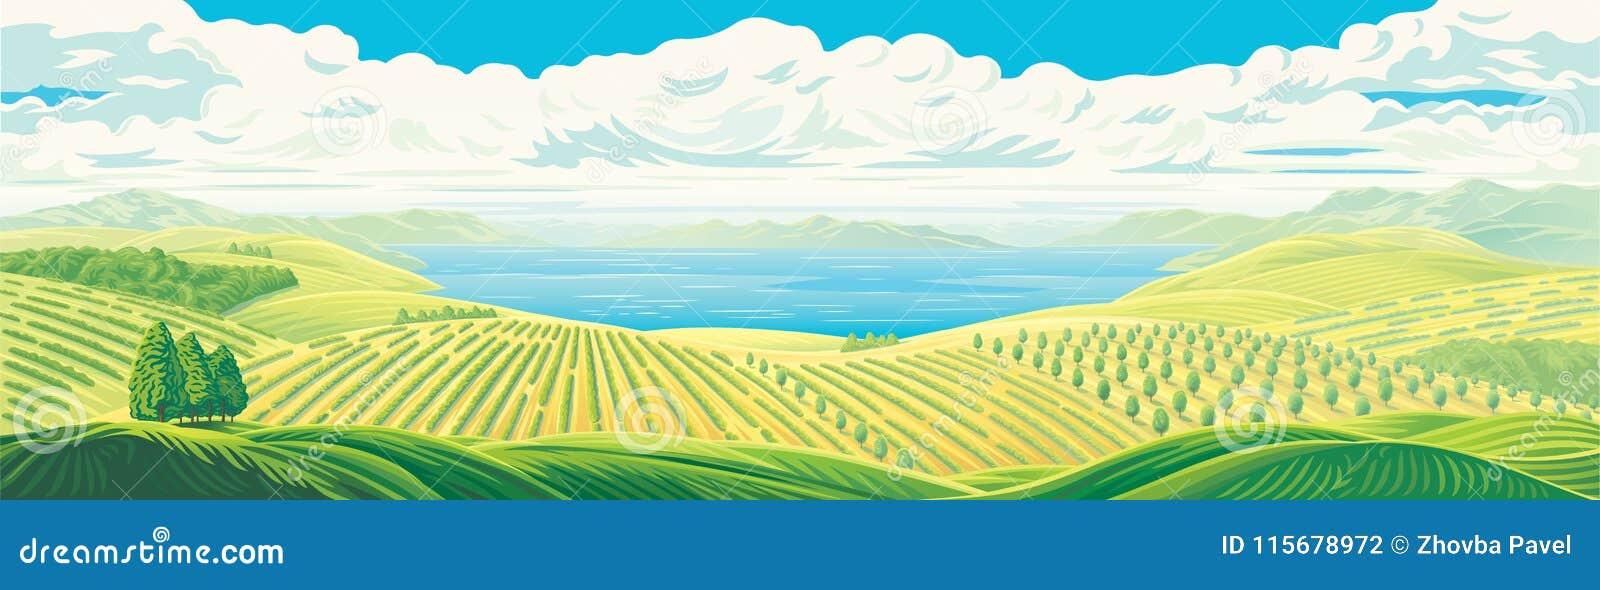 Paysage panoramique rural